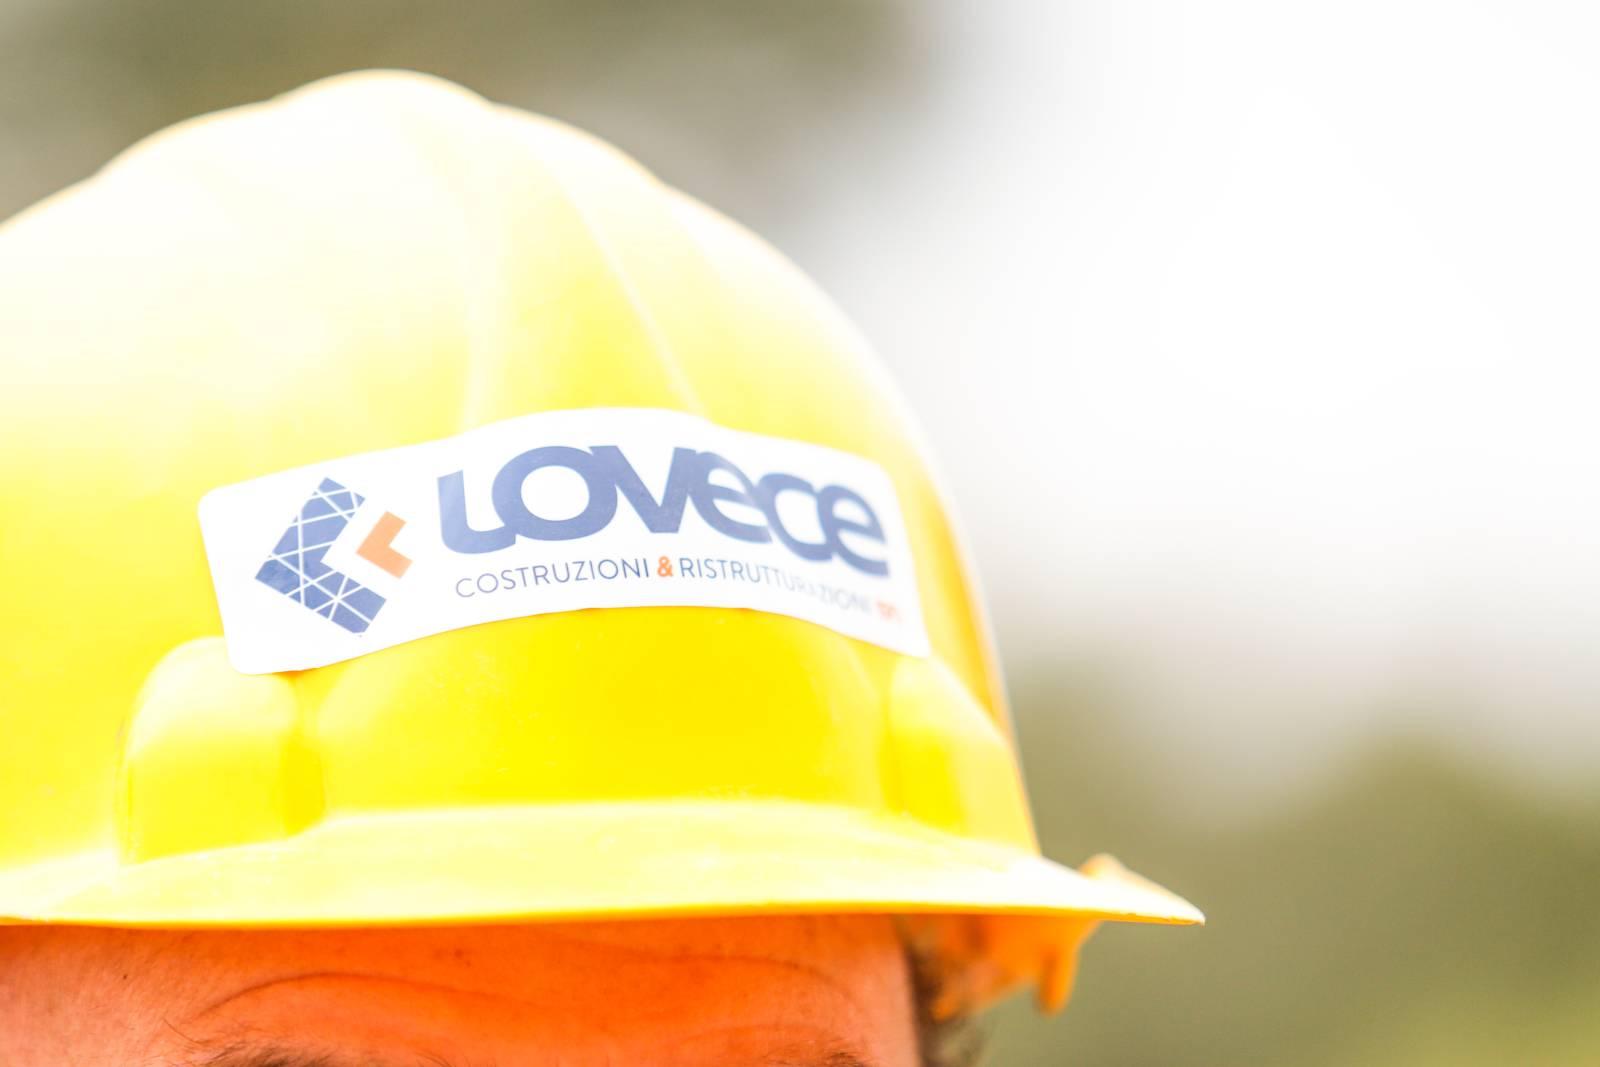 Creazione Sito web Impresa Edile: Lovece - Maingage, Web Agency Bari